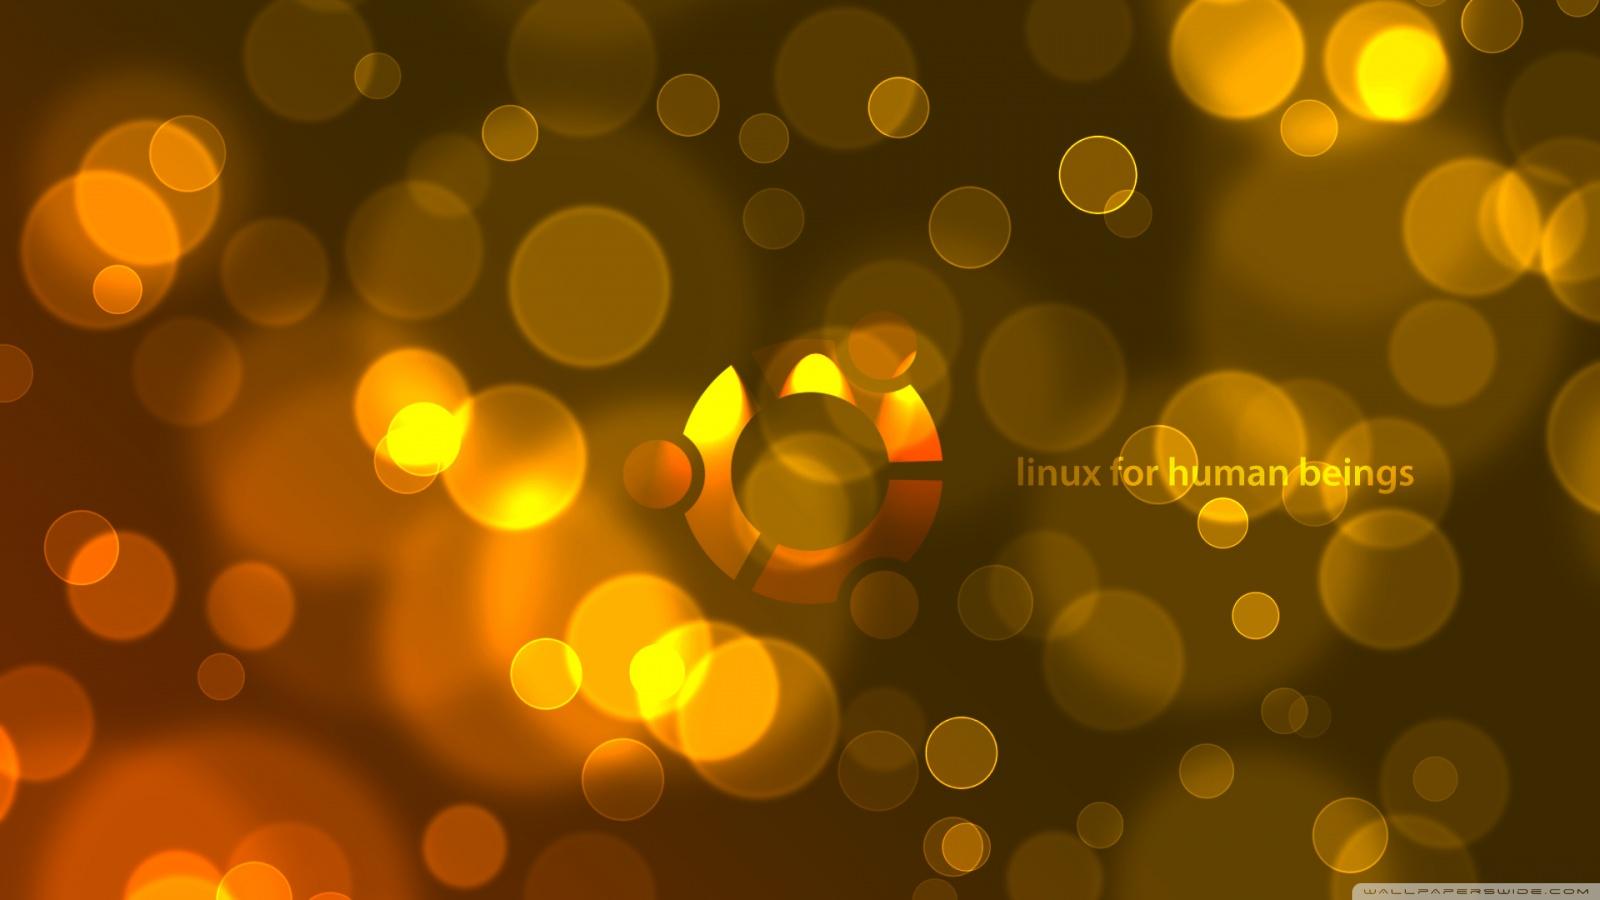 http://3.bp.blogspot.com/-AB8KNpGjXVo/T2LQriB-cFI/AAAAAAAAAcE/VyhNTAheV5o/s1600/ubuntu_bokeh-wallpaper-1600x900.jpg